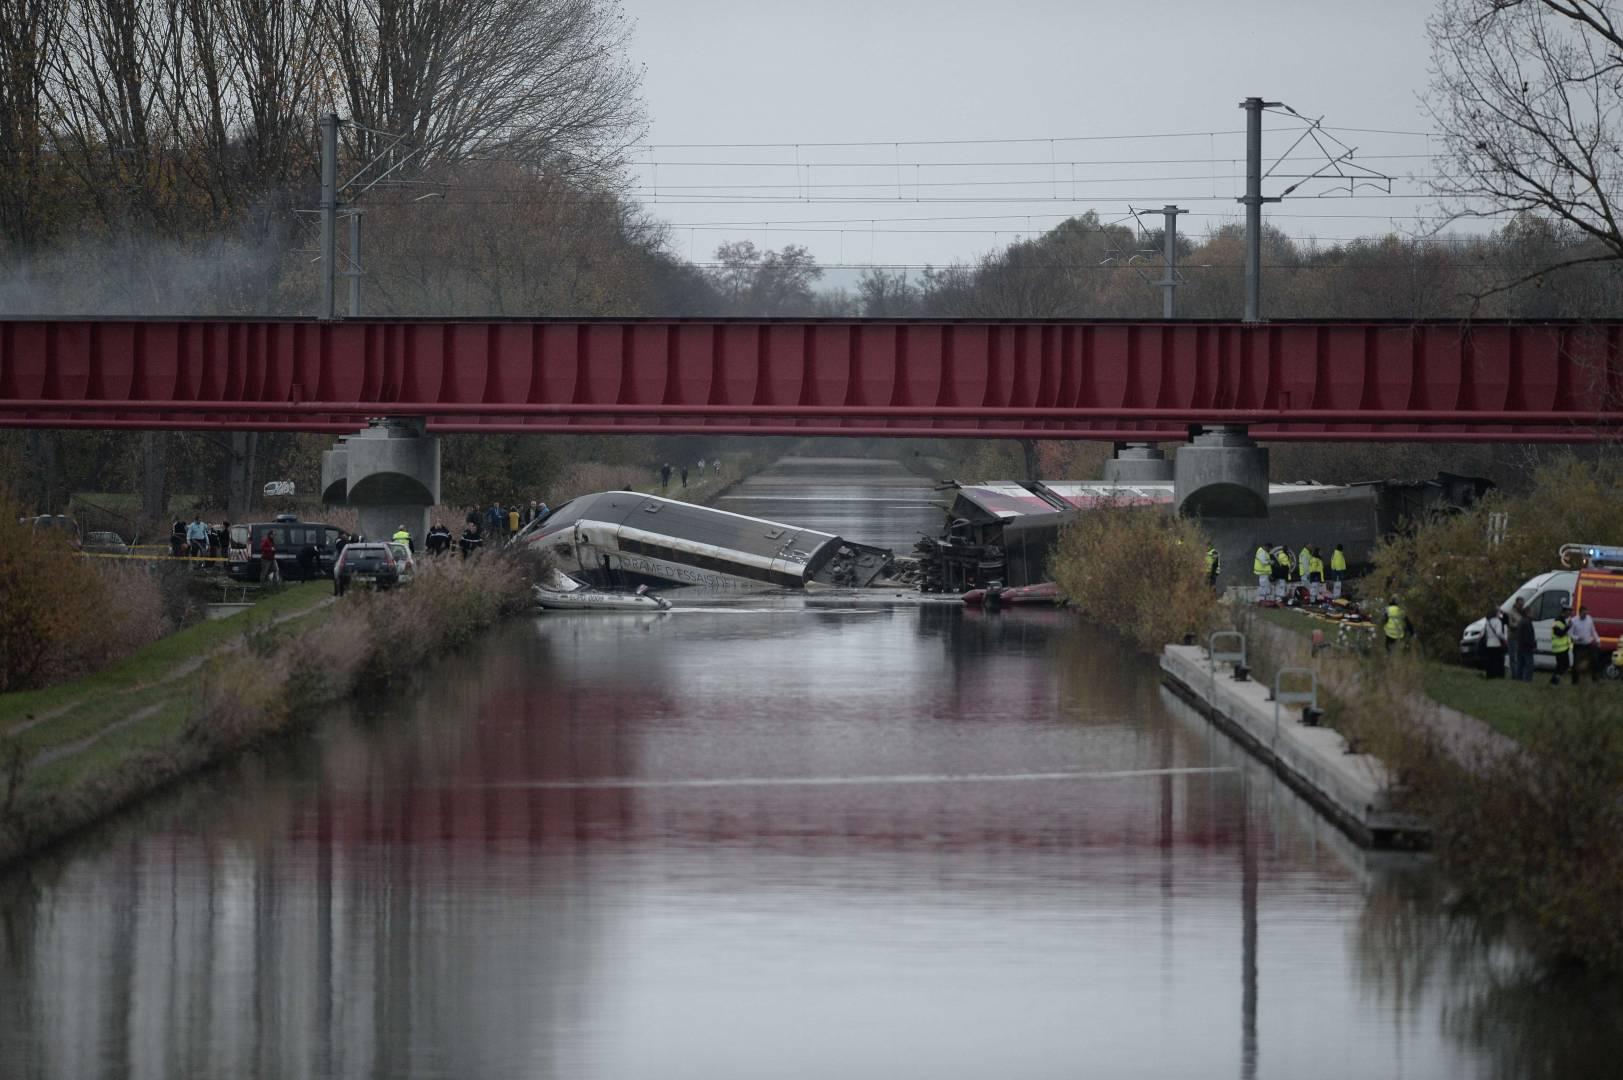 Imagen del TGV accidentado. Foto: Eshop mall.